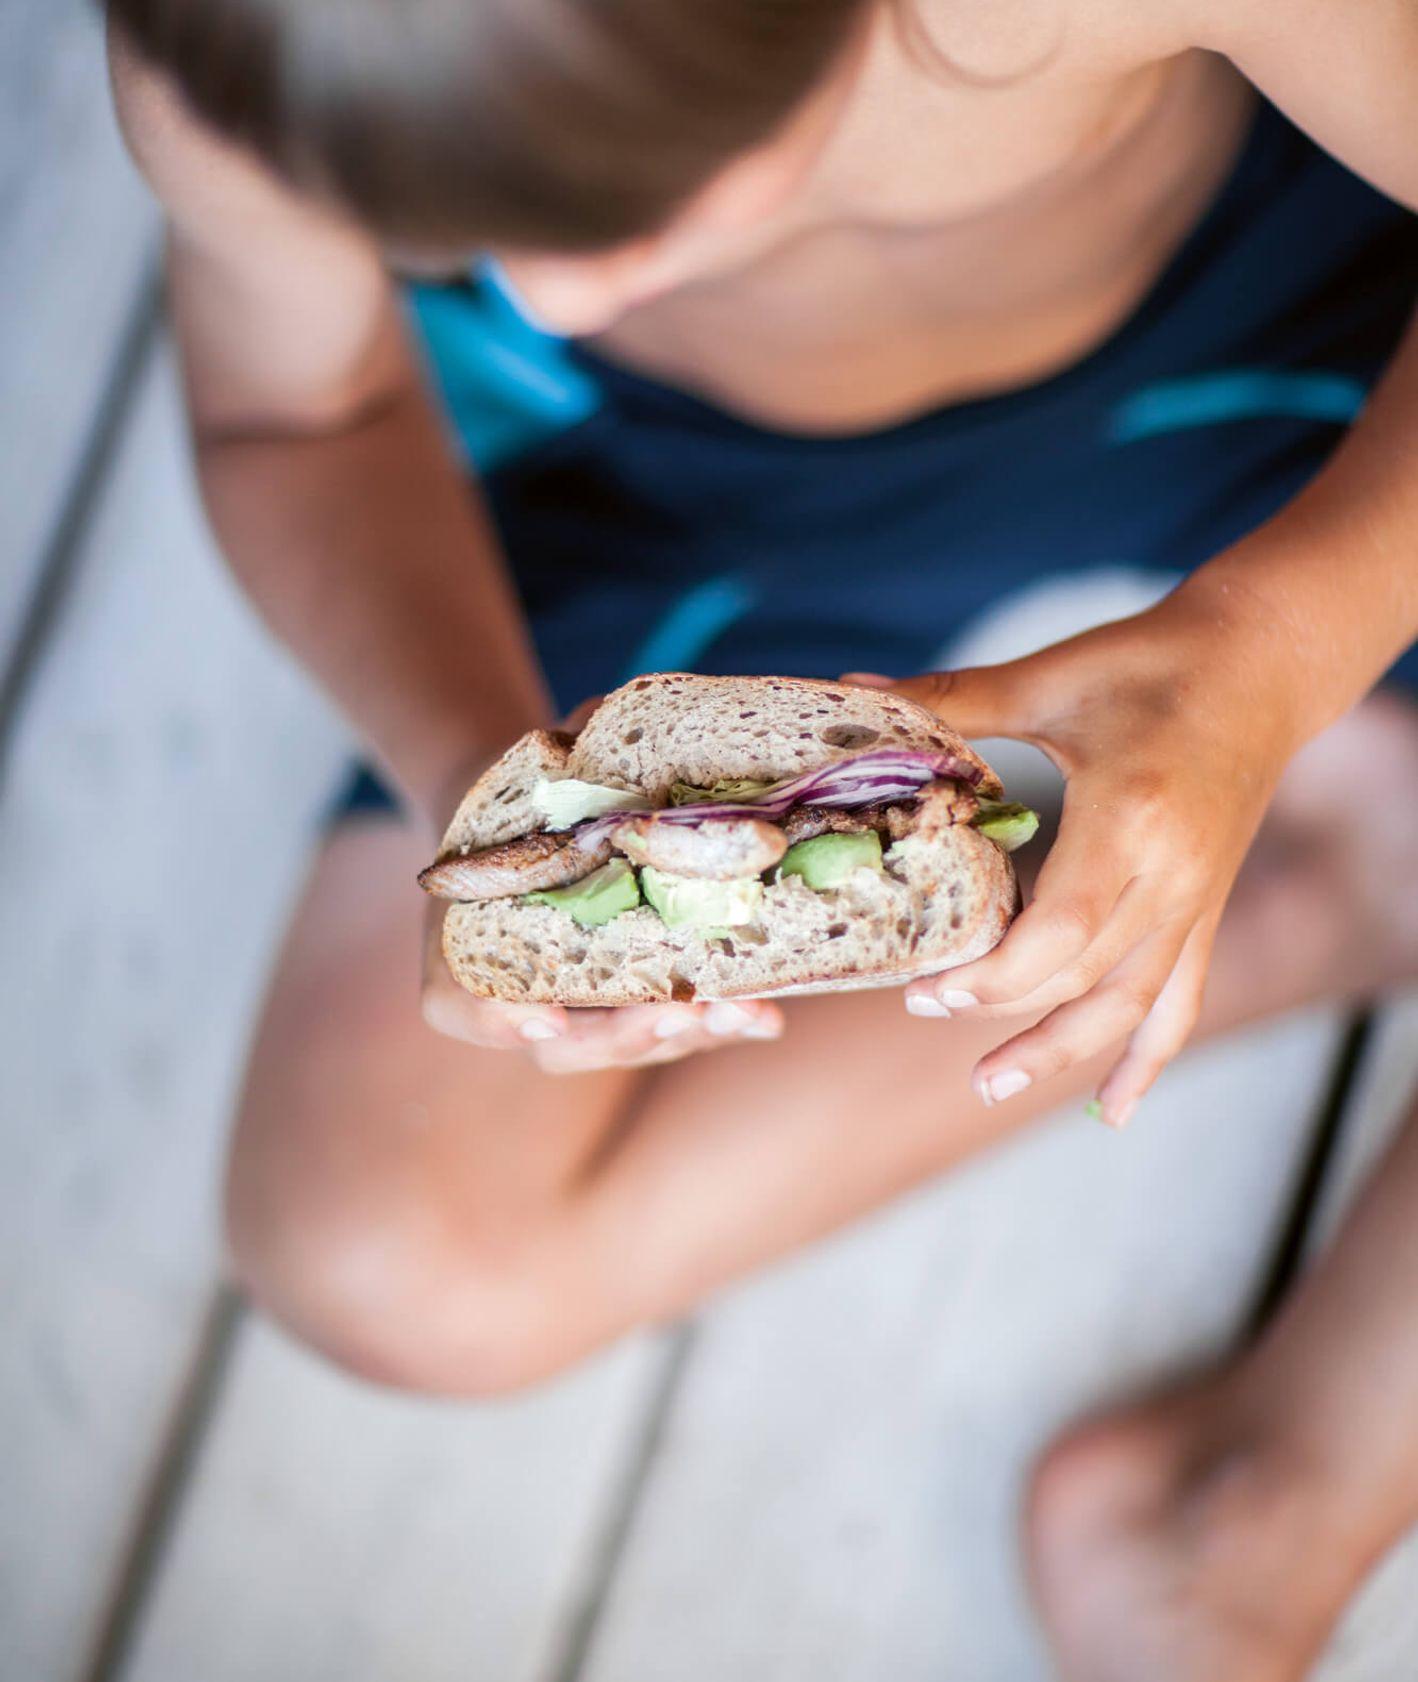 Kanapka z indykiem idealna na szybki posiłek na plażę (fot. Rafał Meszka)